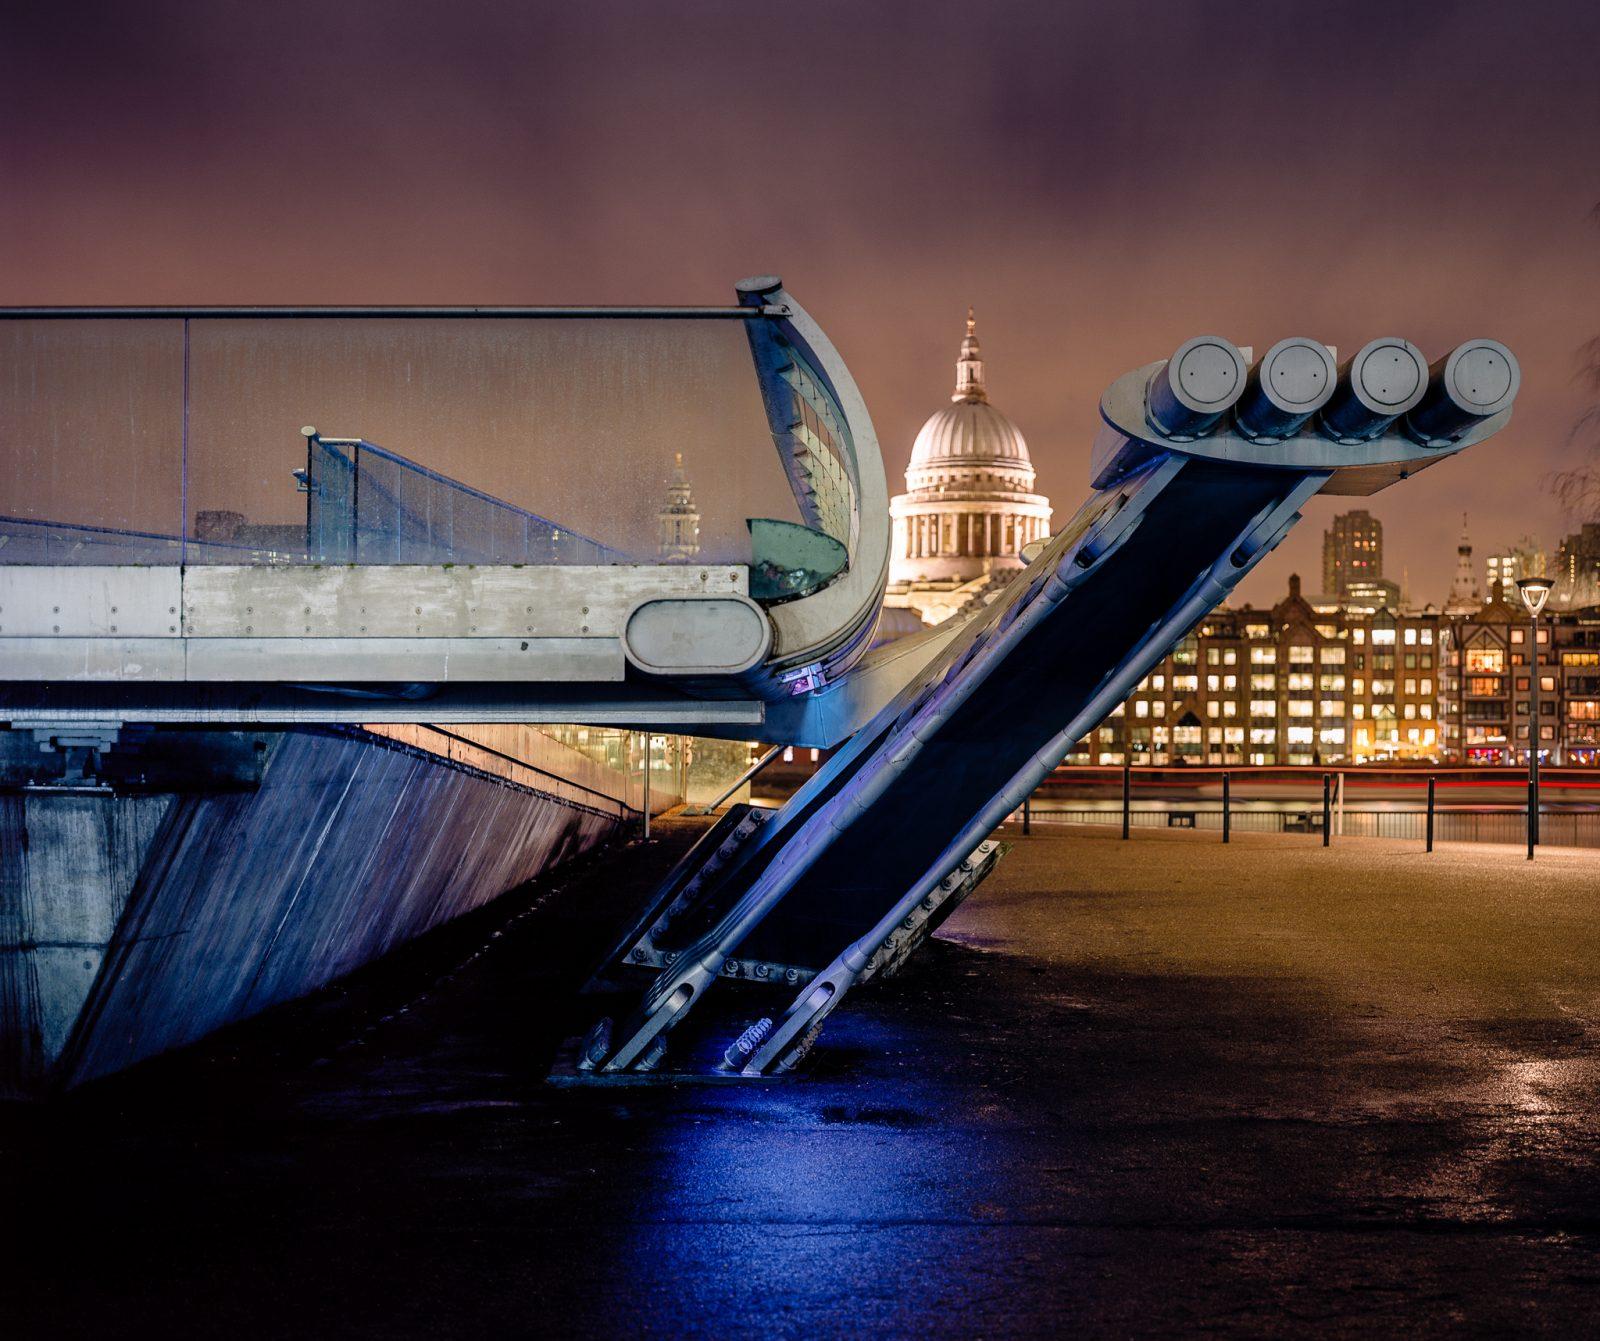 A Bridge to St Pauls